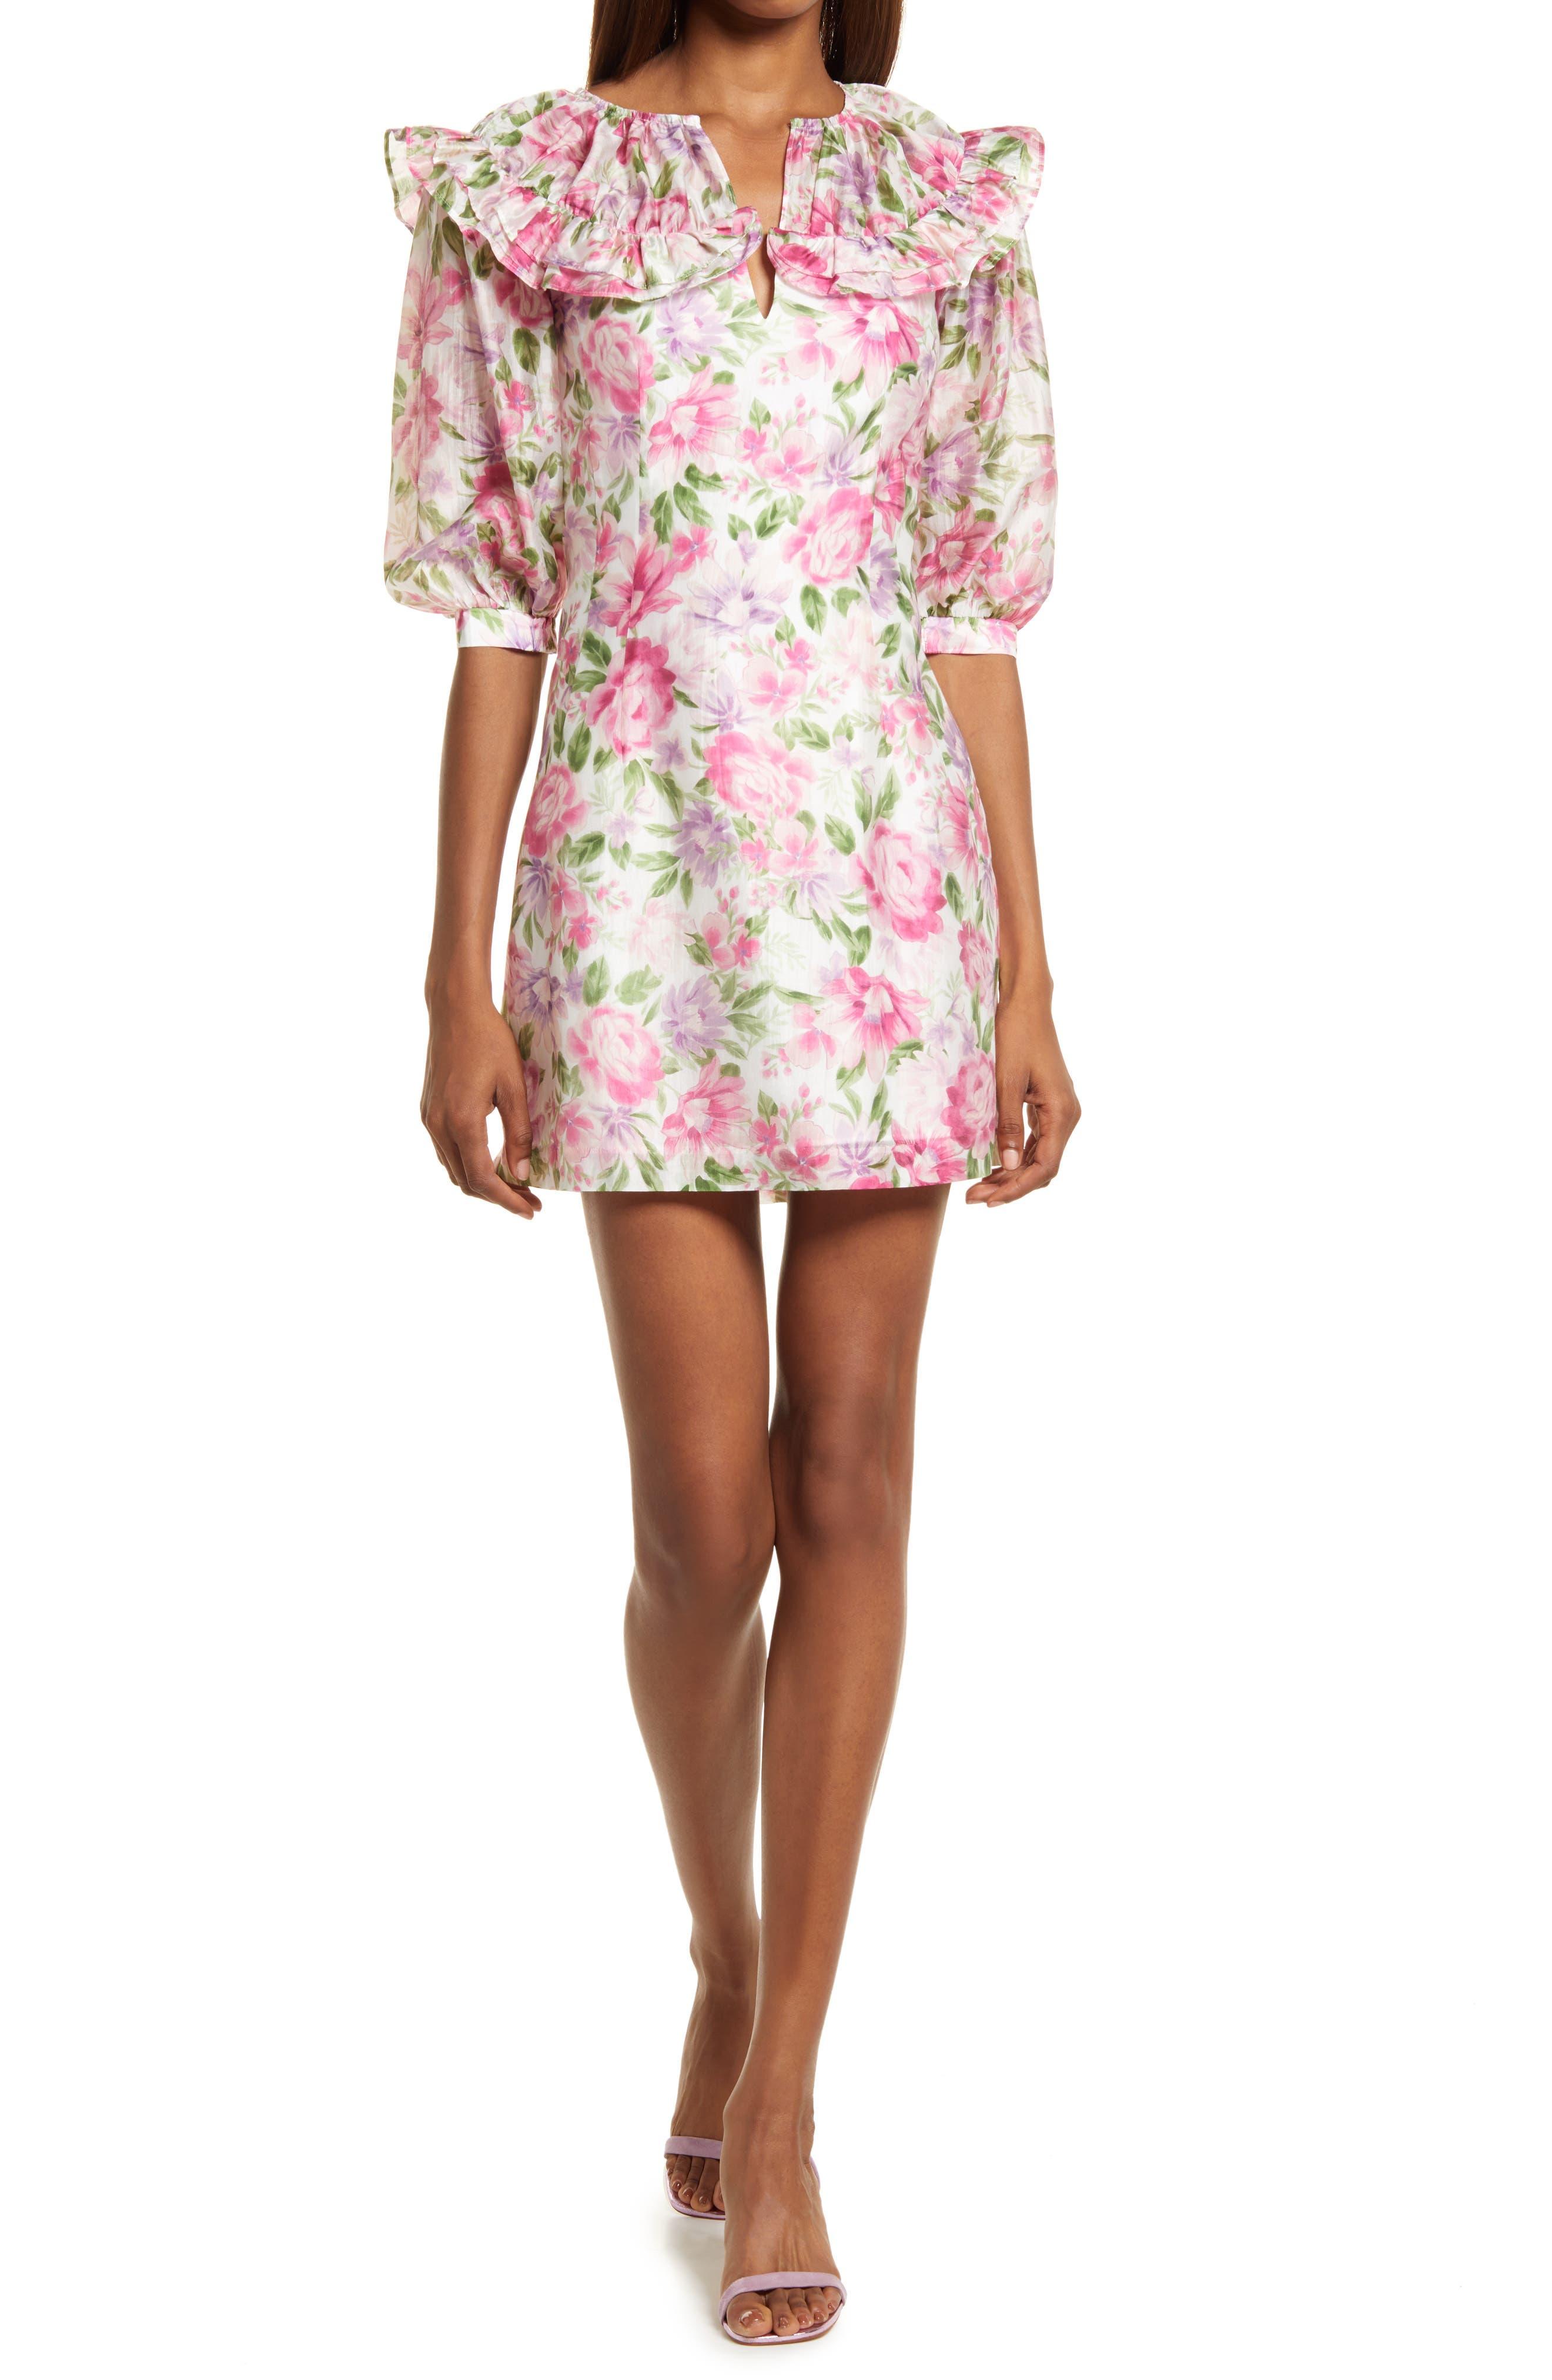 Denise Floral Ruffle Minidress